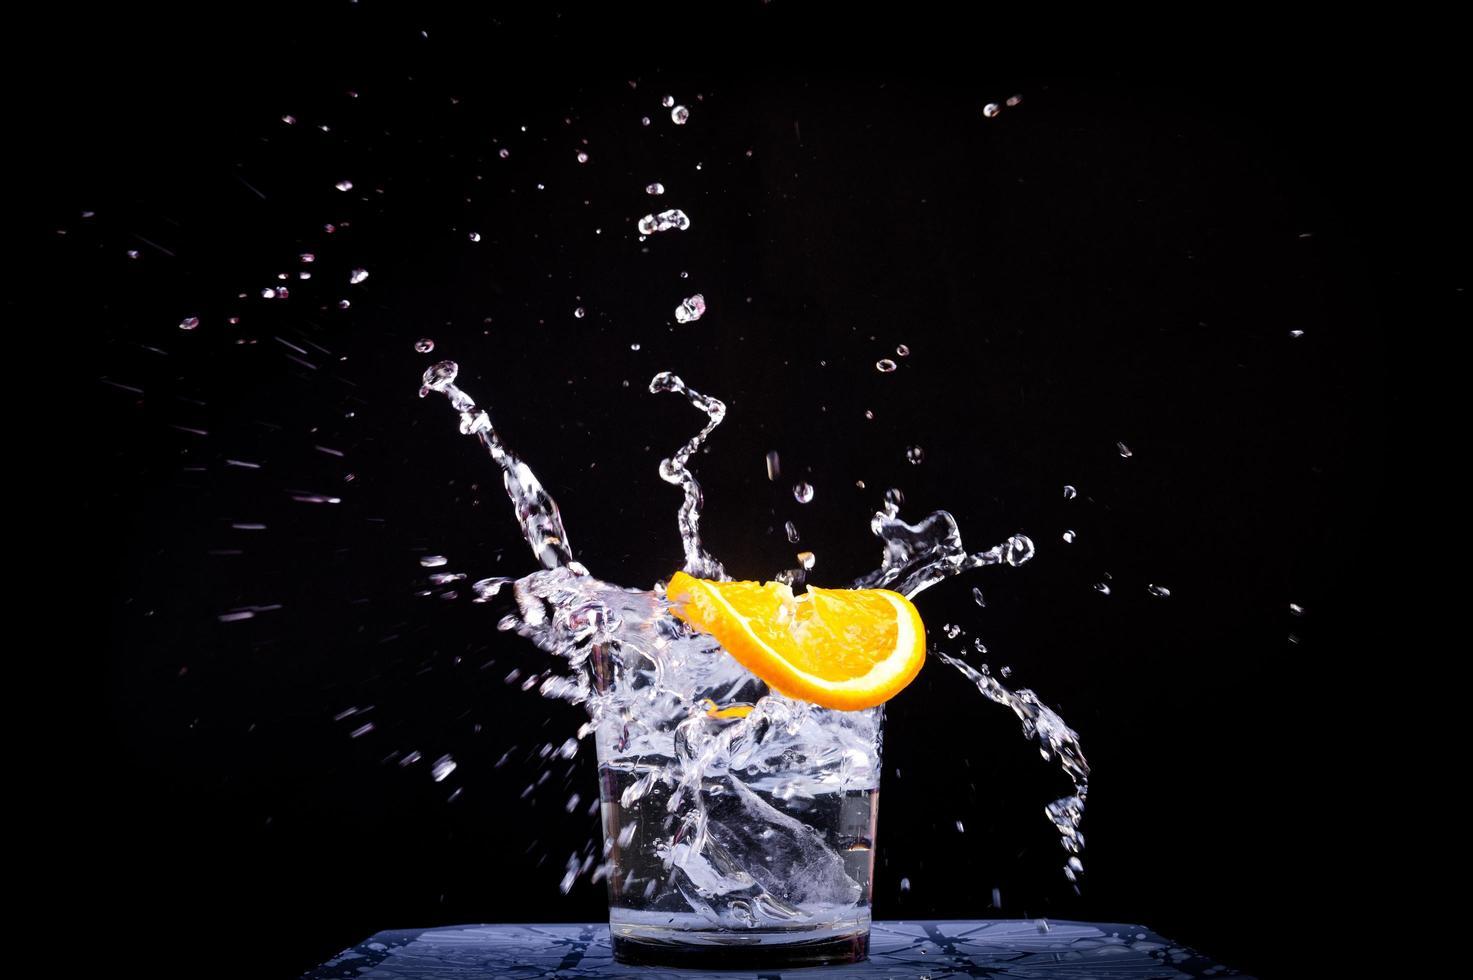 Splash of water in glass with sliced lemon photo